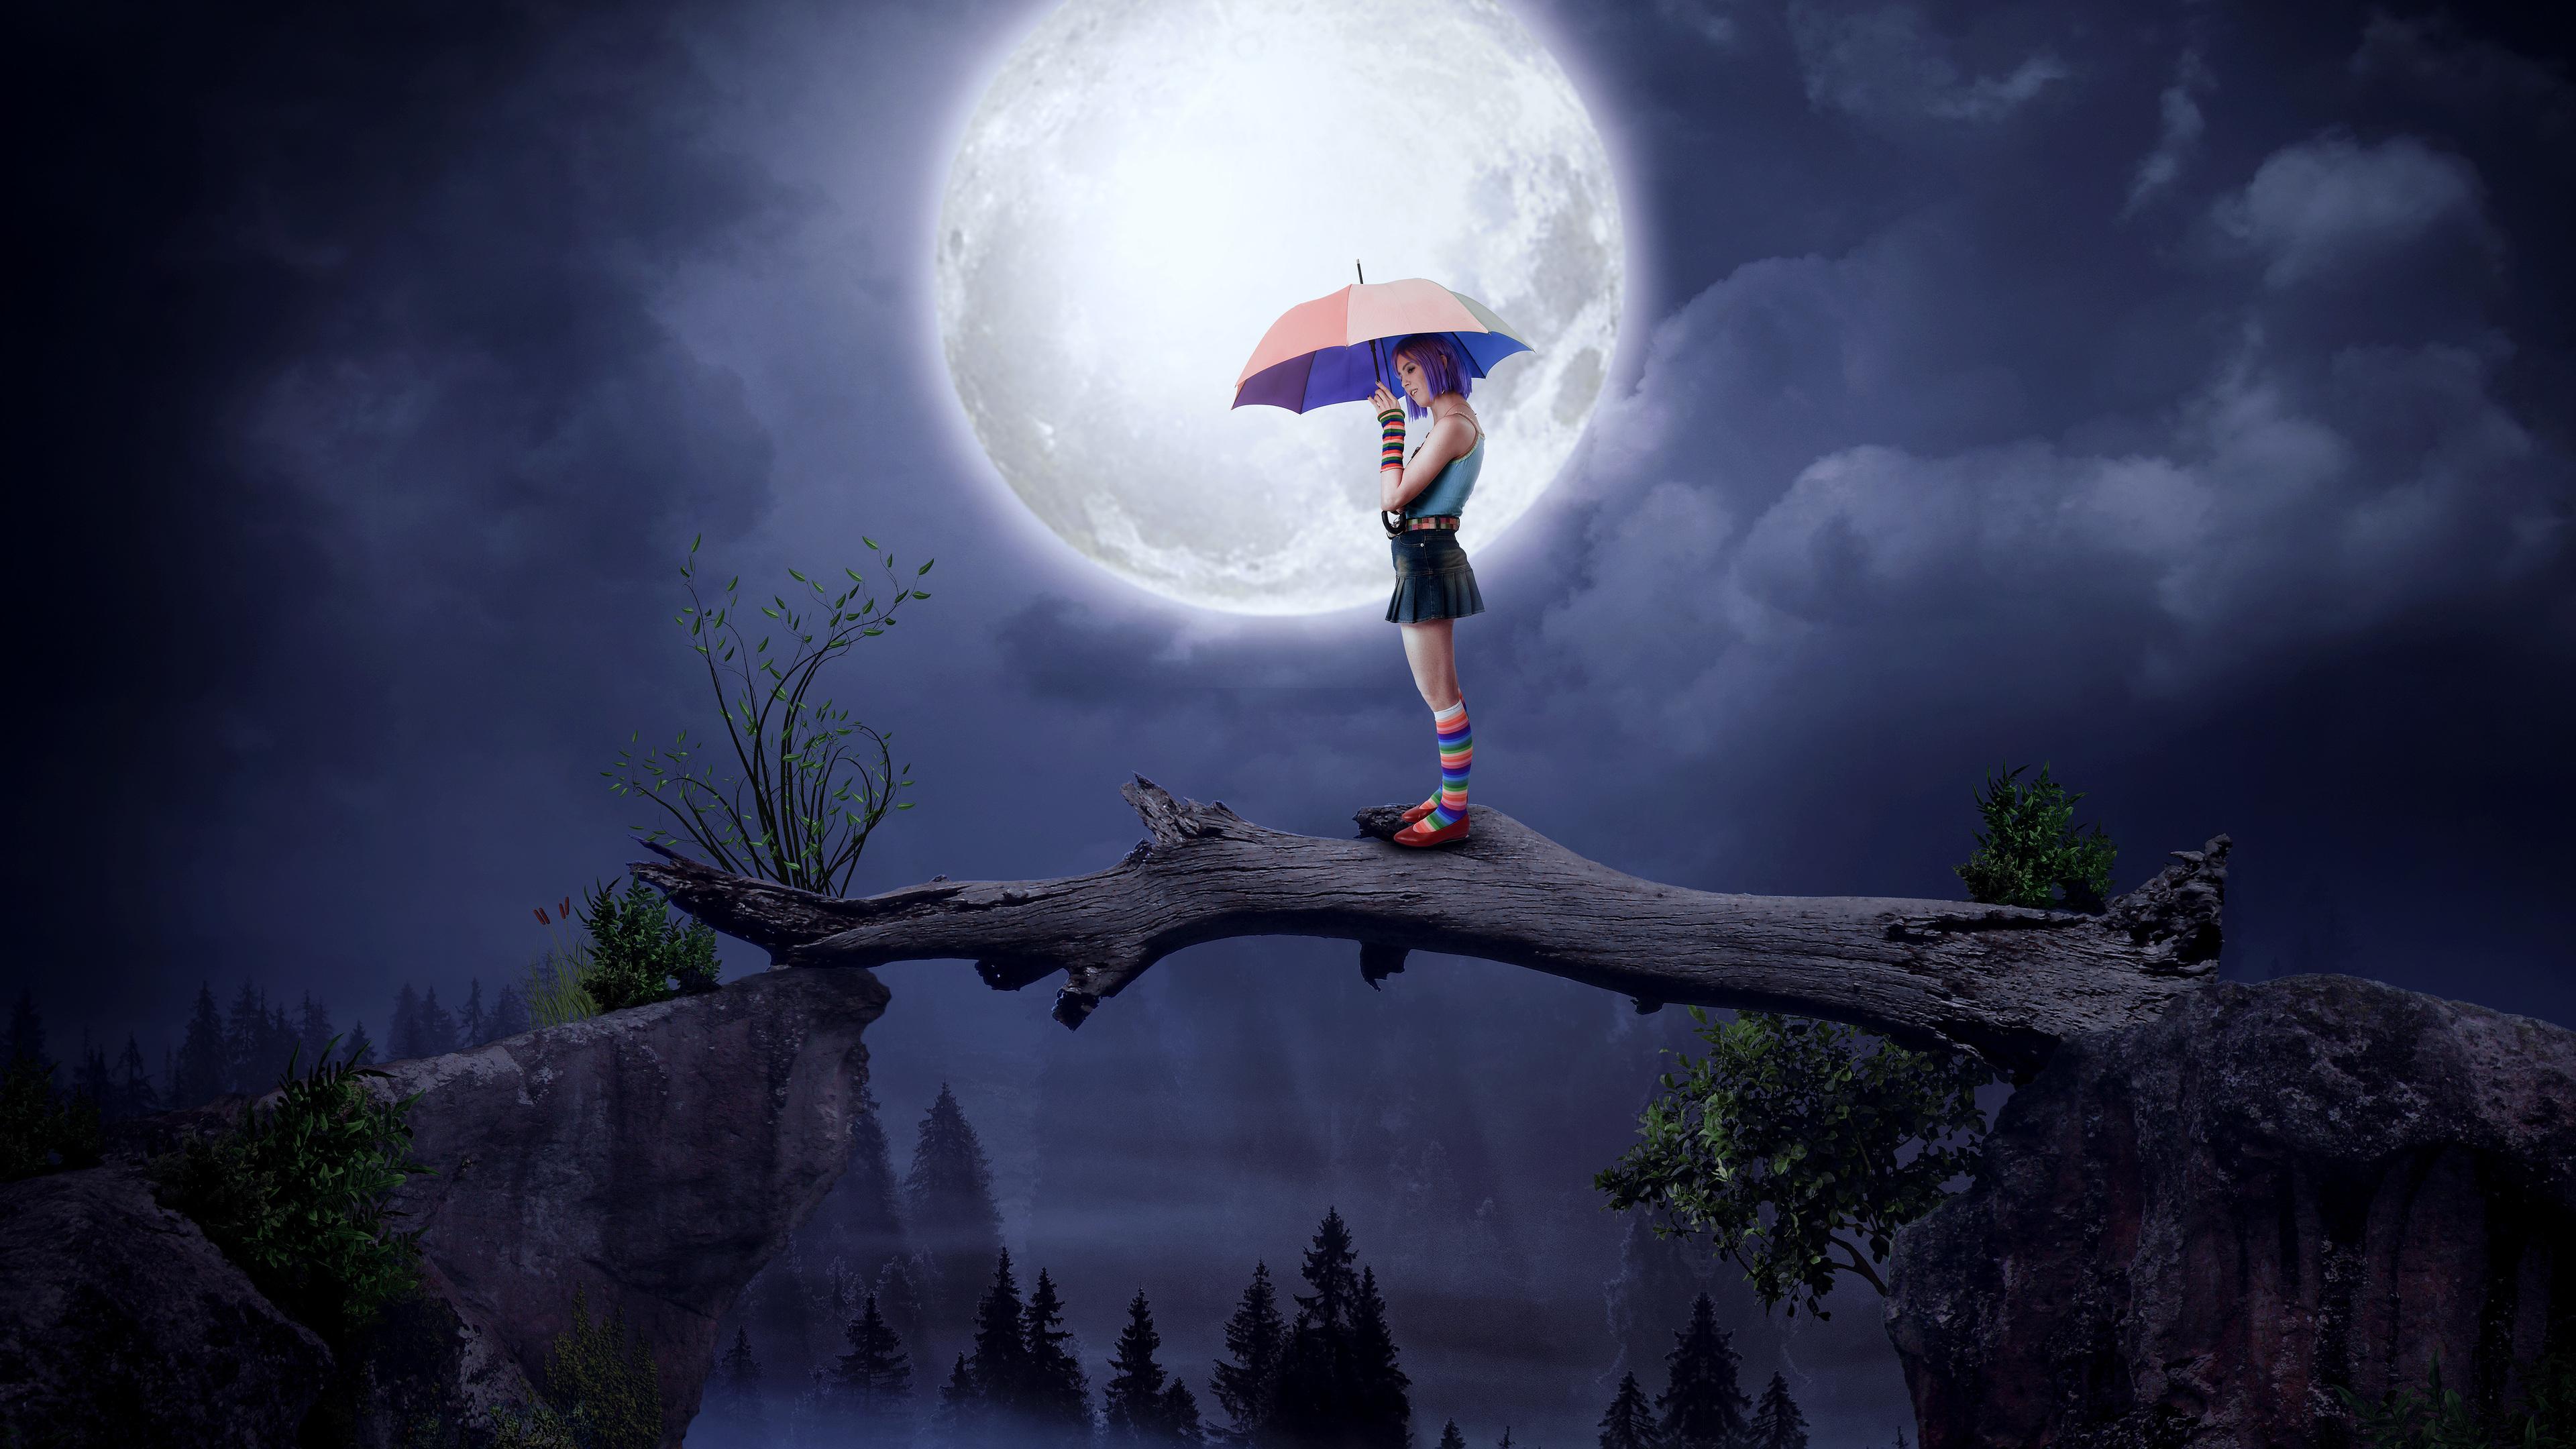 Wallpaper 4k Girl With Umbrella Big Moon Digital Art 4k 4k